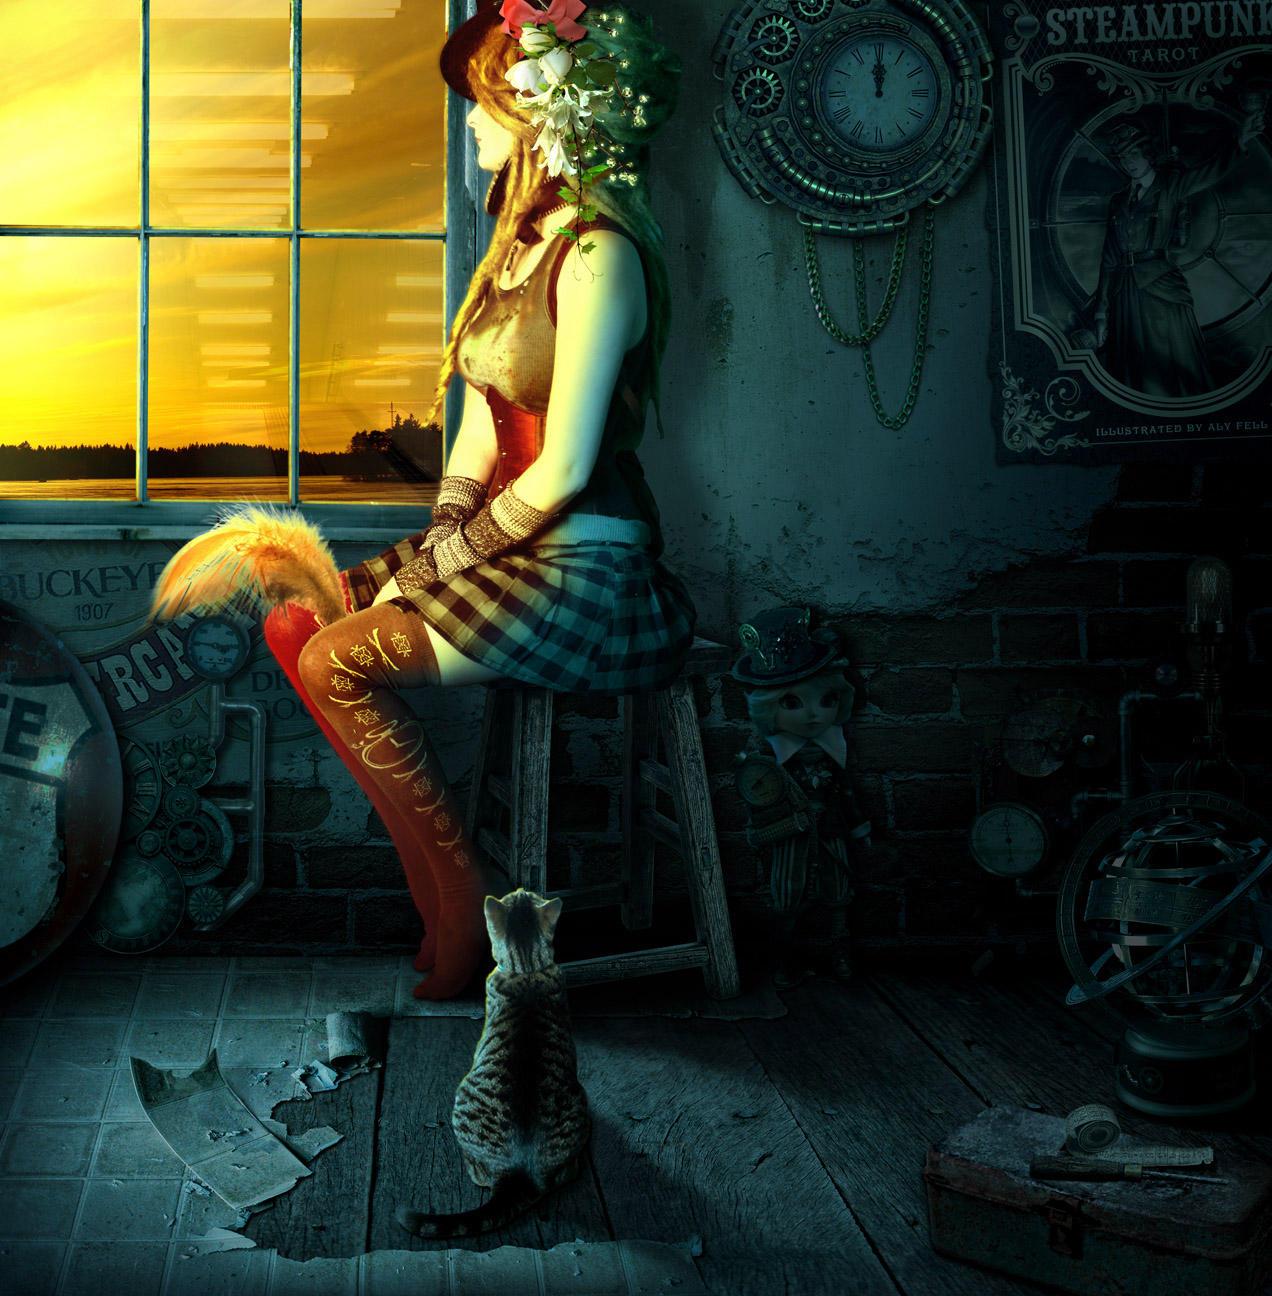 Dreamer by funkwood